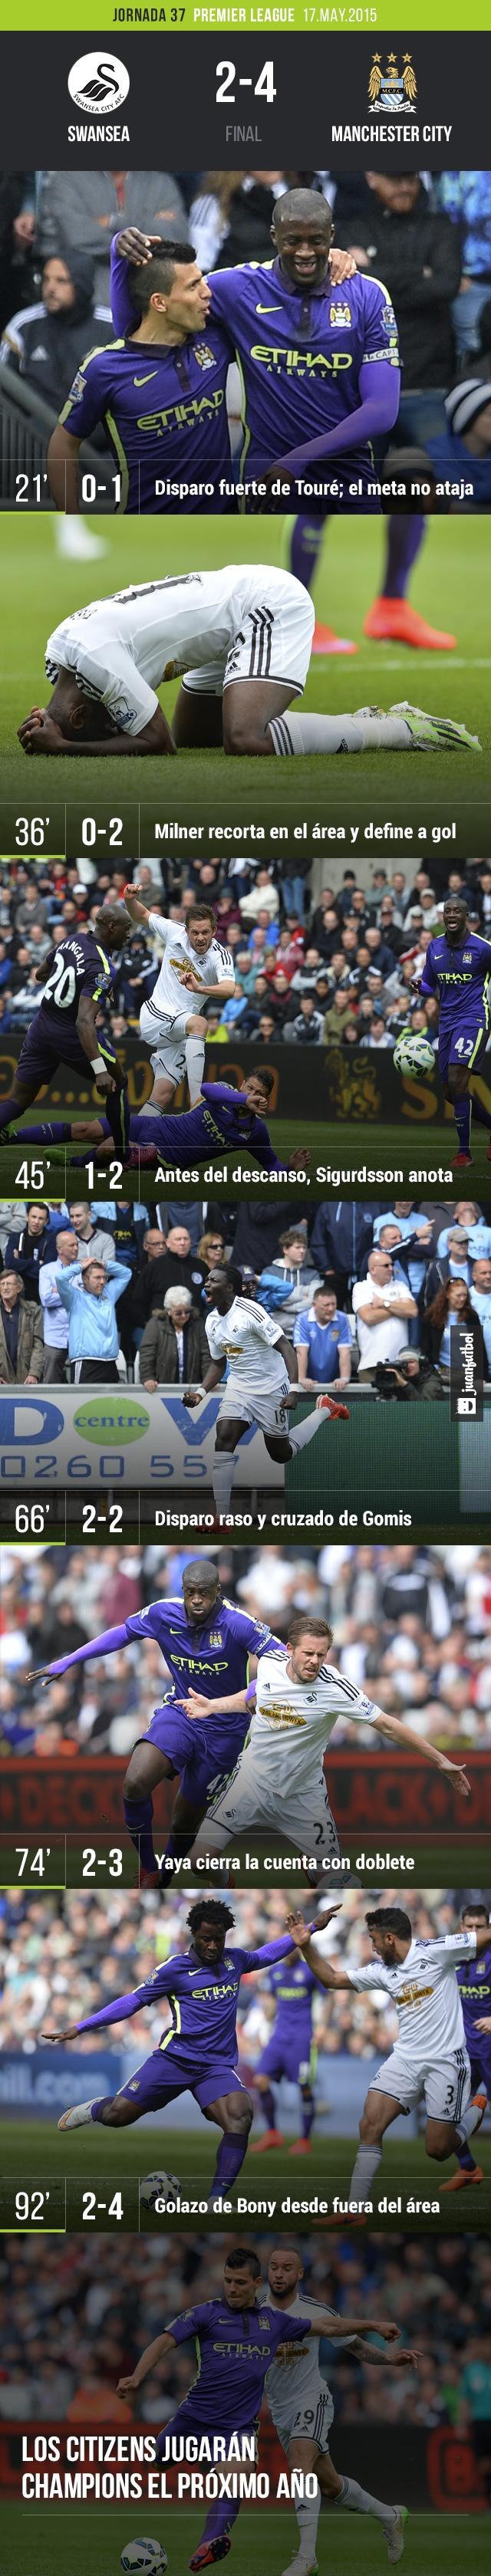 Swansea 2-4 Manchester City